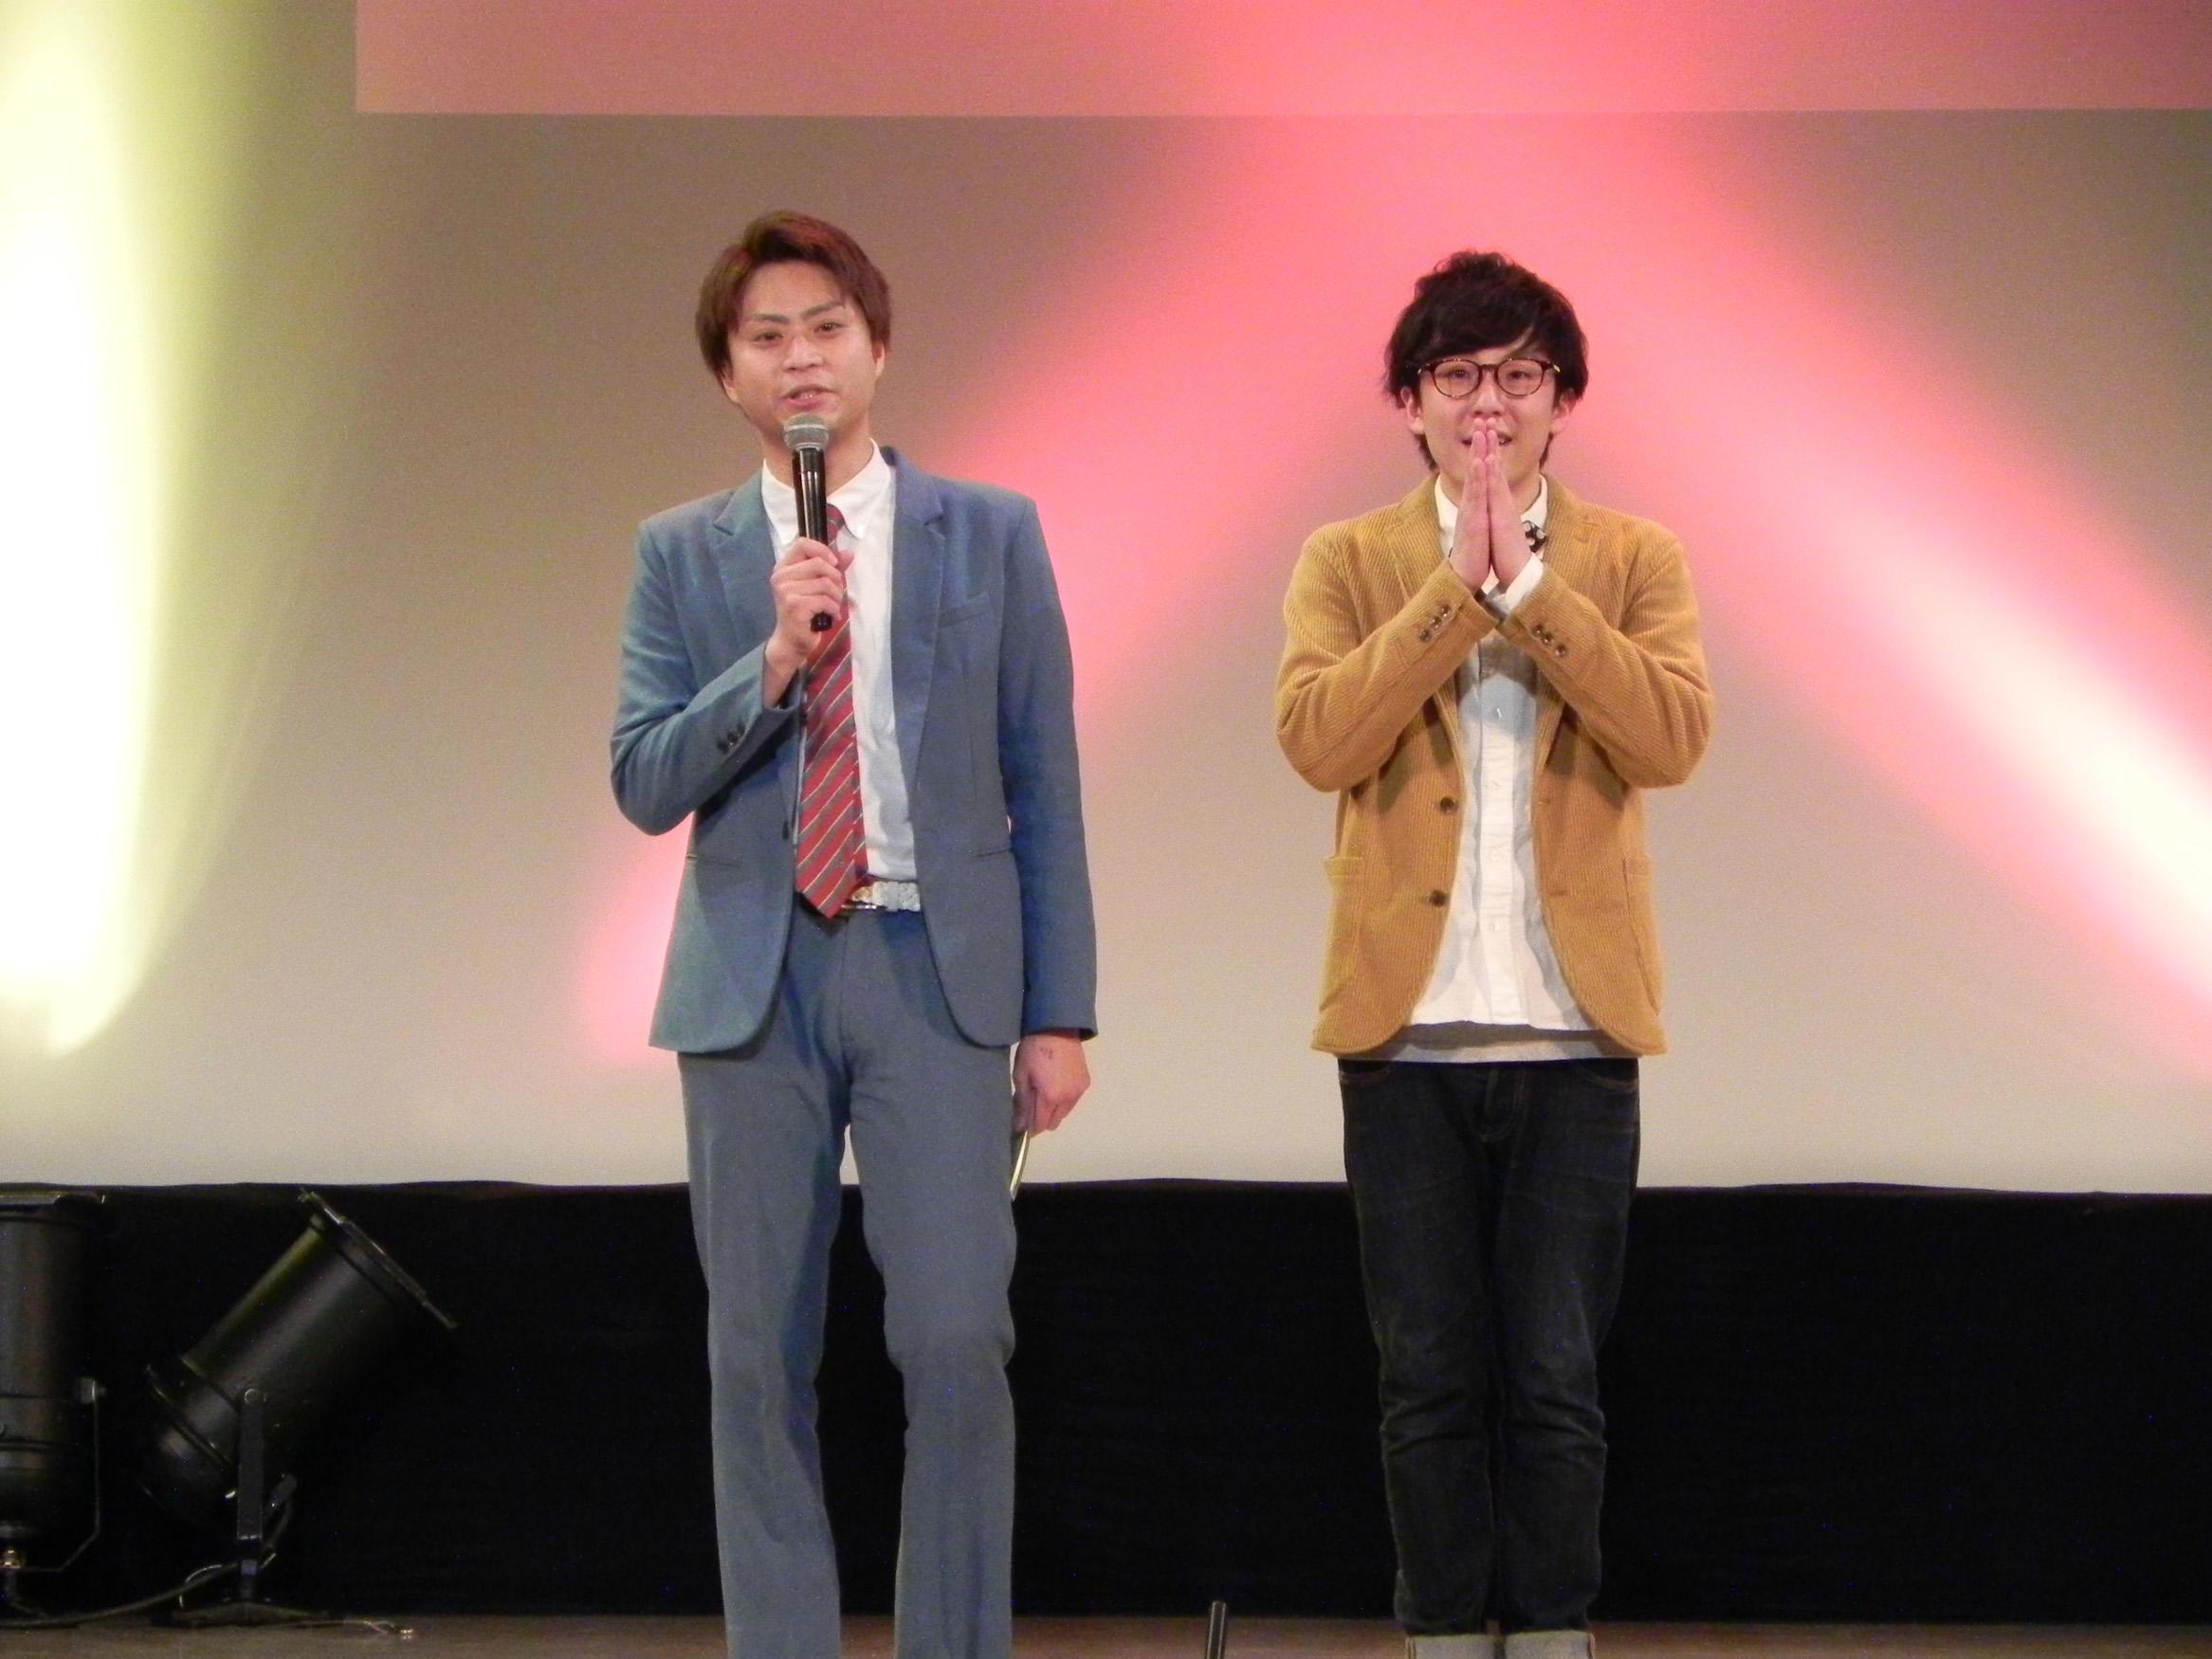 http://news.yoshimoto.co.jp/20170425152905-88845806d7c97f75460e770b10ac87ffa81fec56.jpg